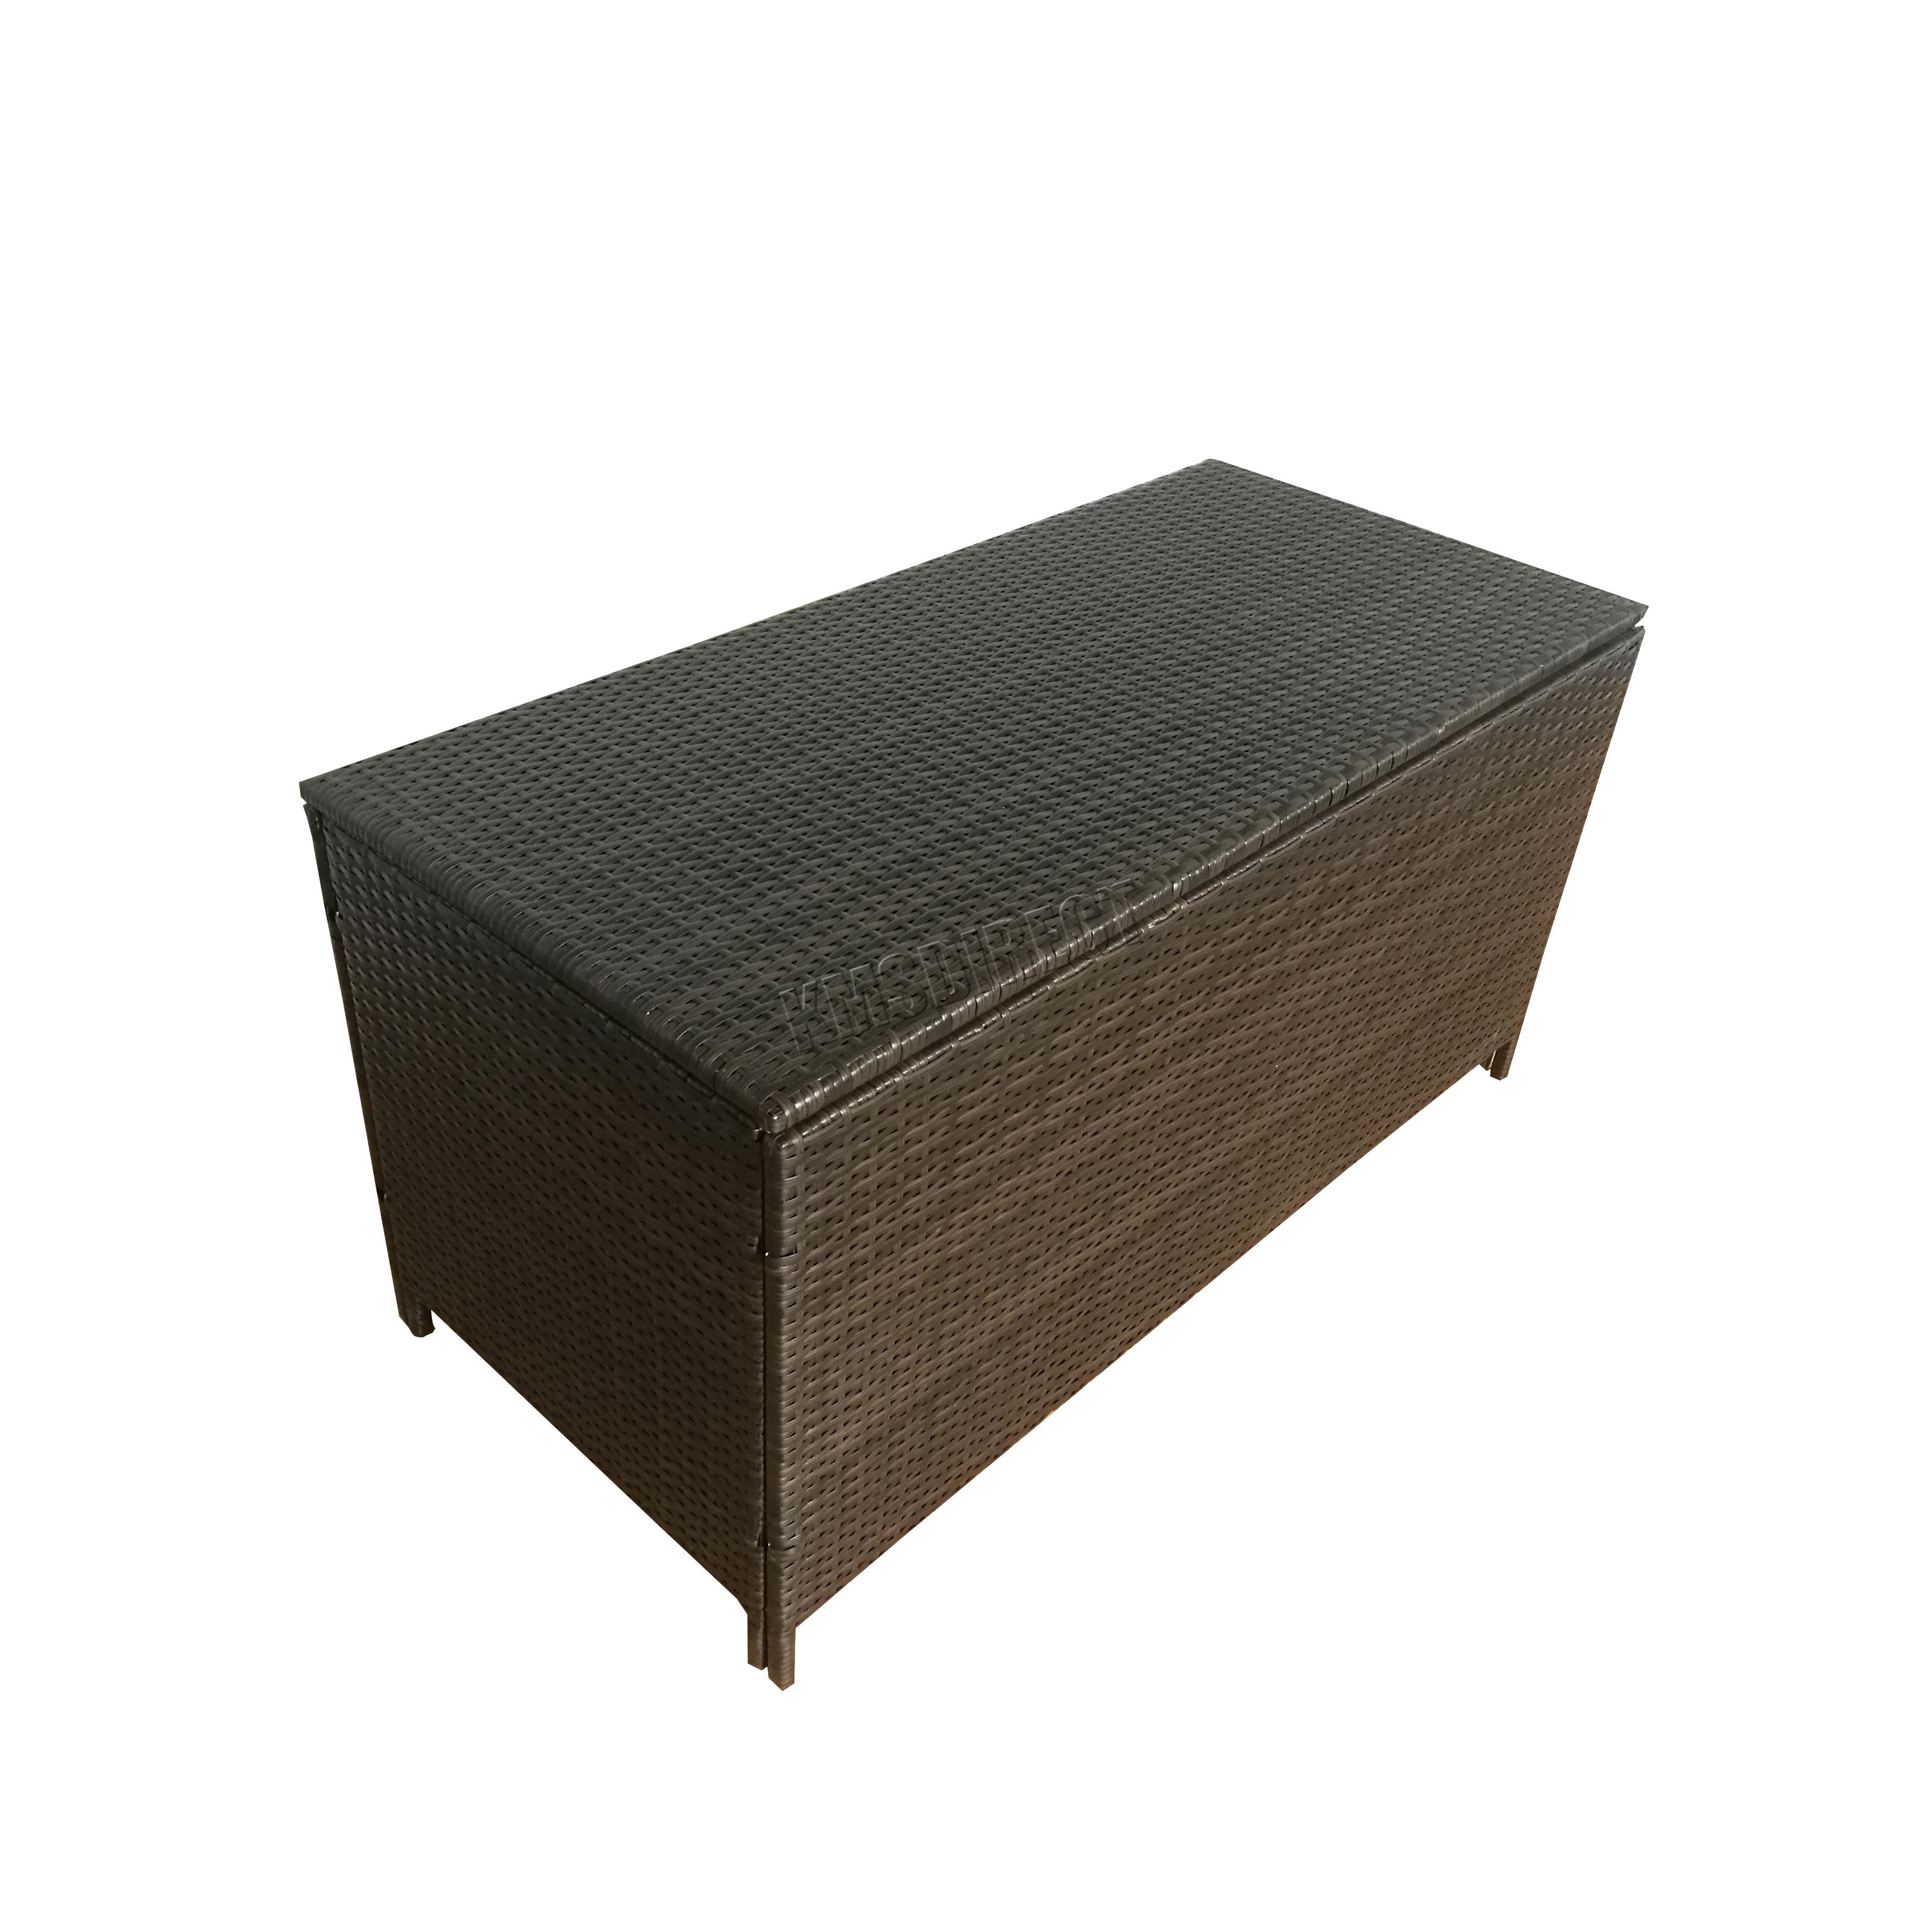 FoxHunter Muebles de jardín Ratán Caja almacenaje tejido Pecho Patio ...